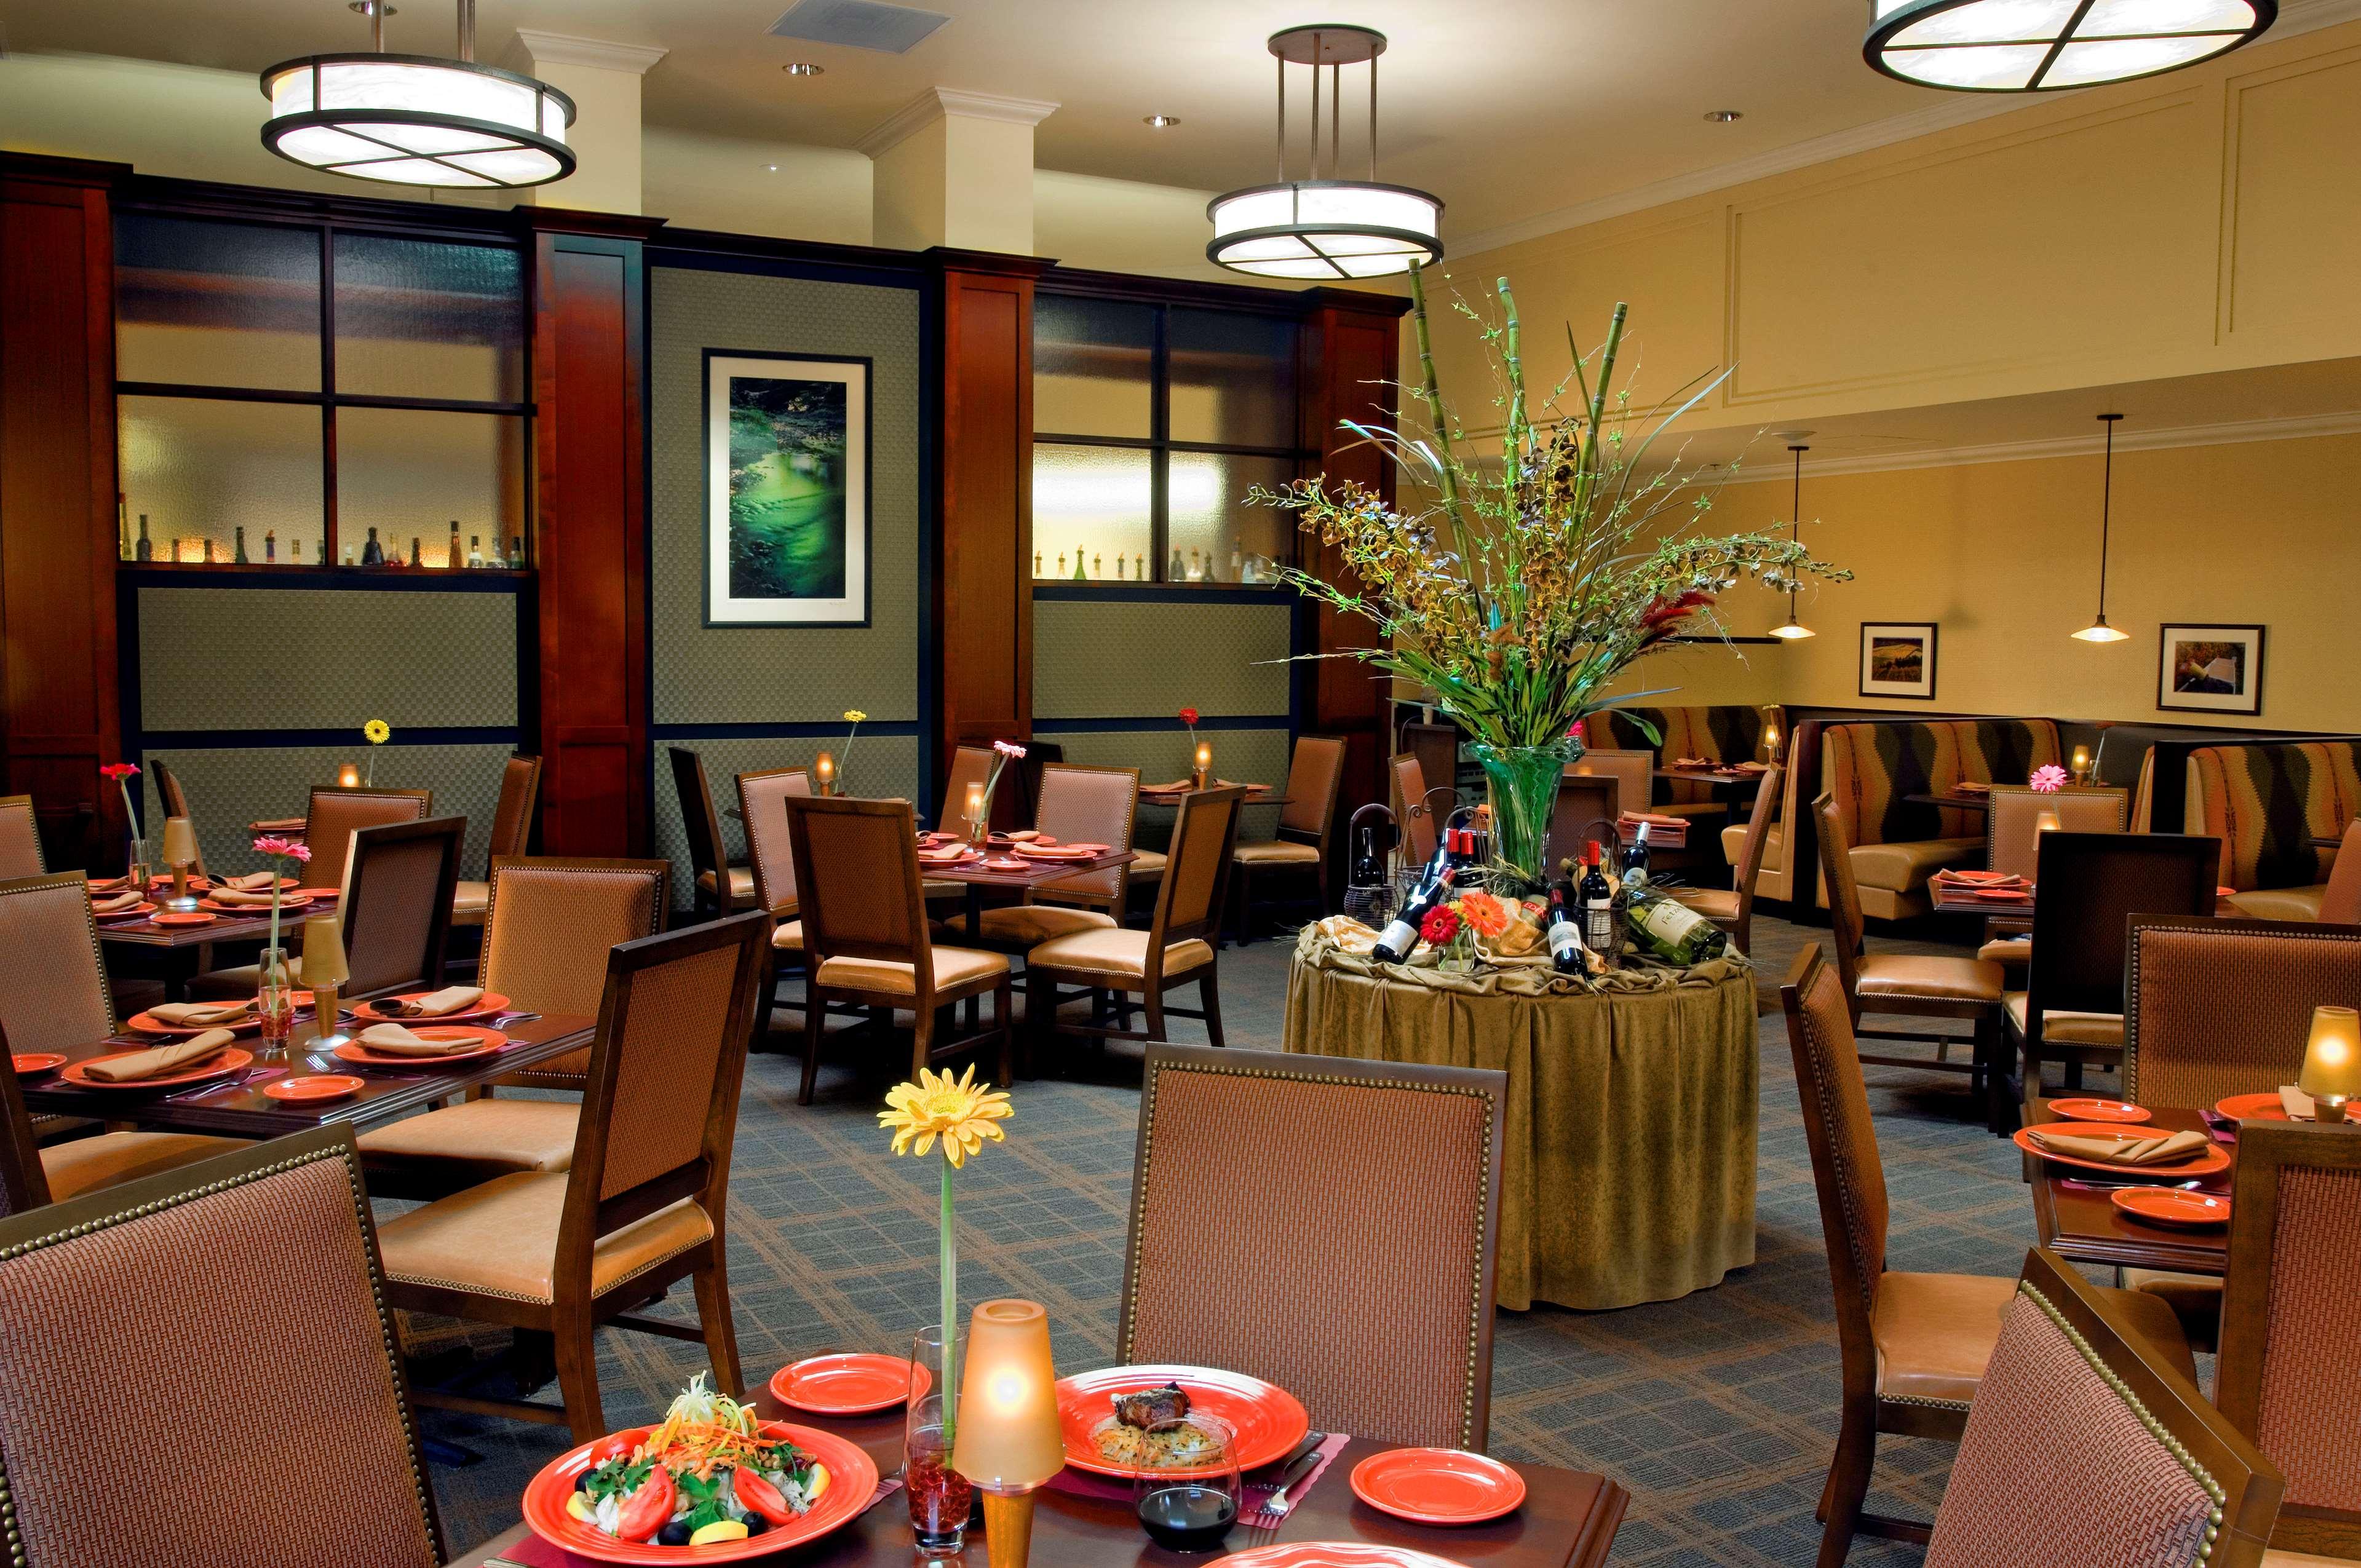 sheraton portland airport hotel portland oregon or. Black Bedroom Furniture Sets. Home Design Ideas